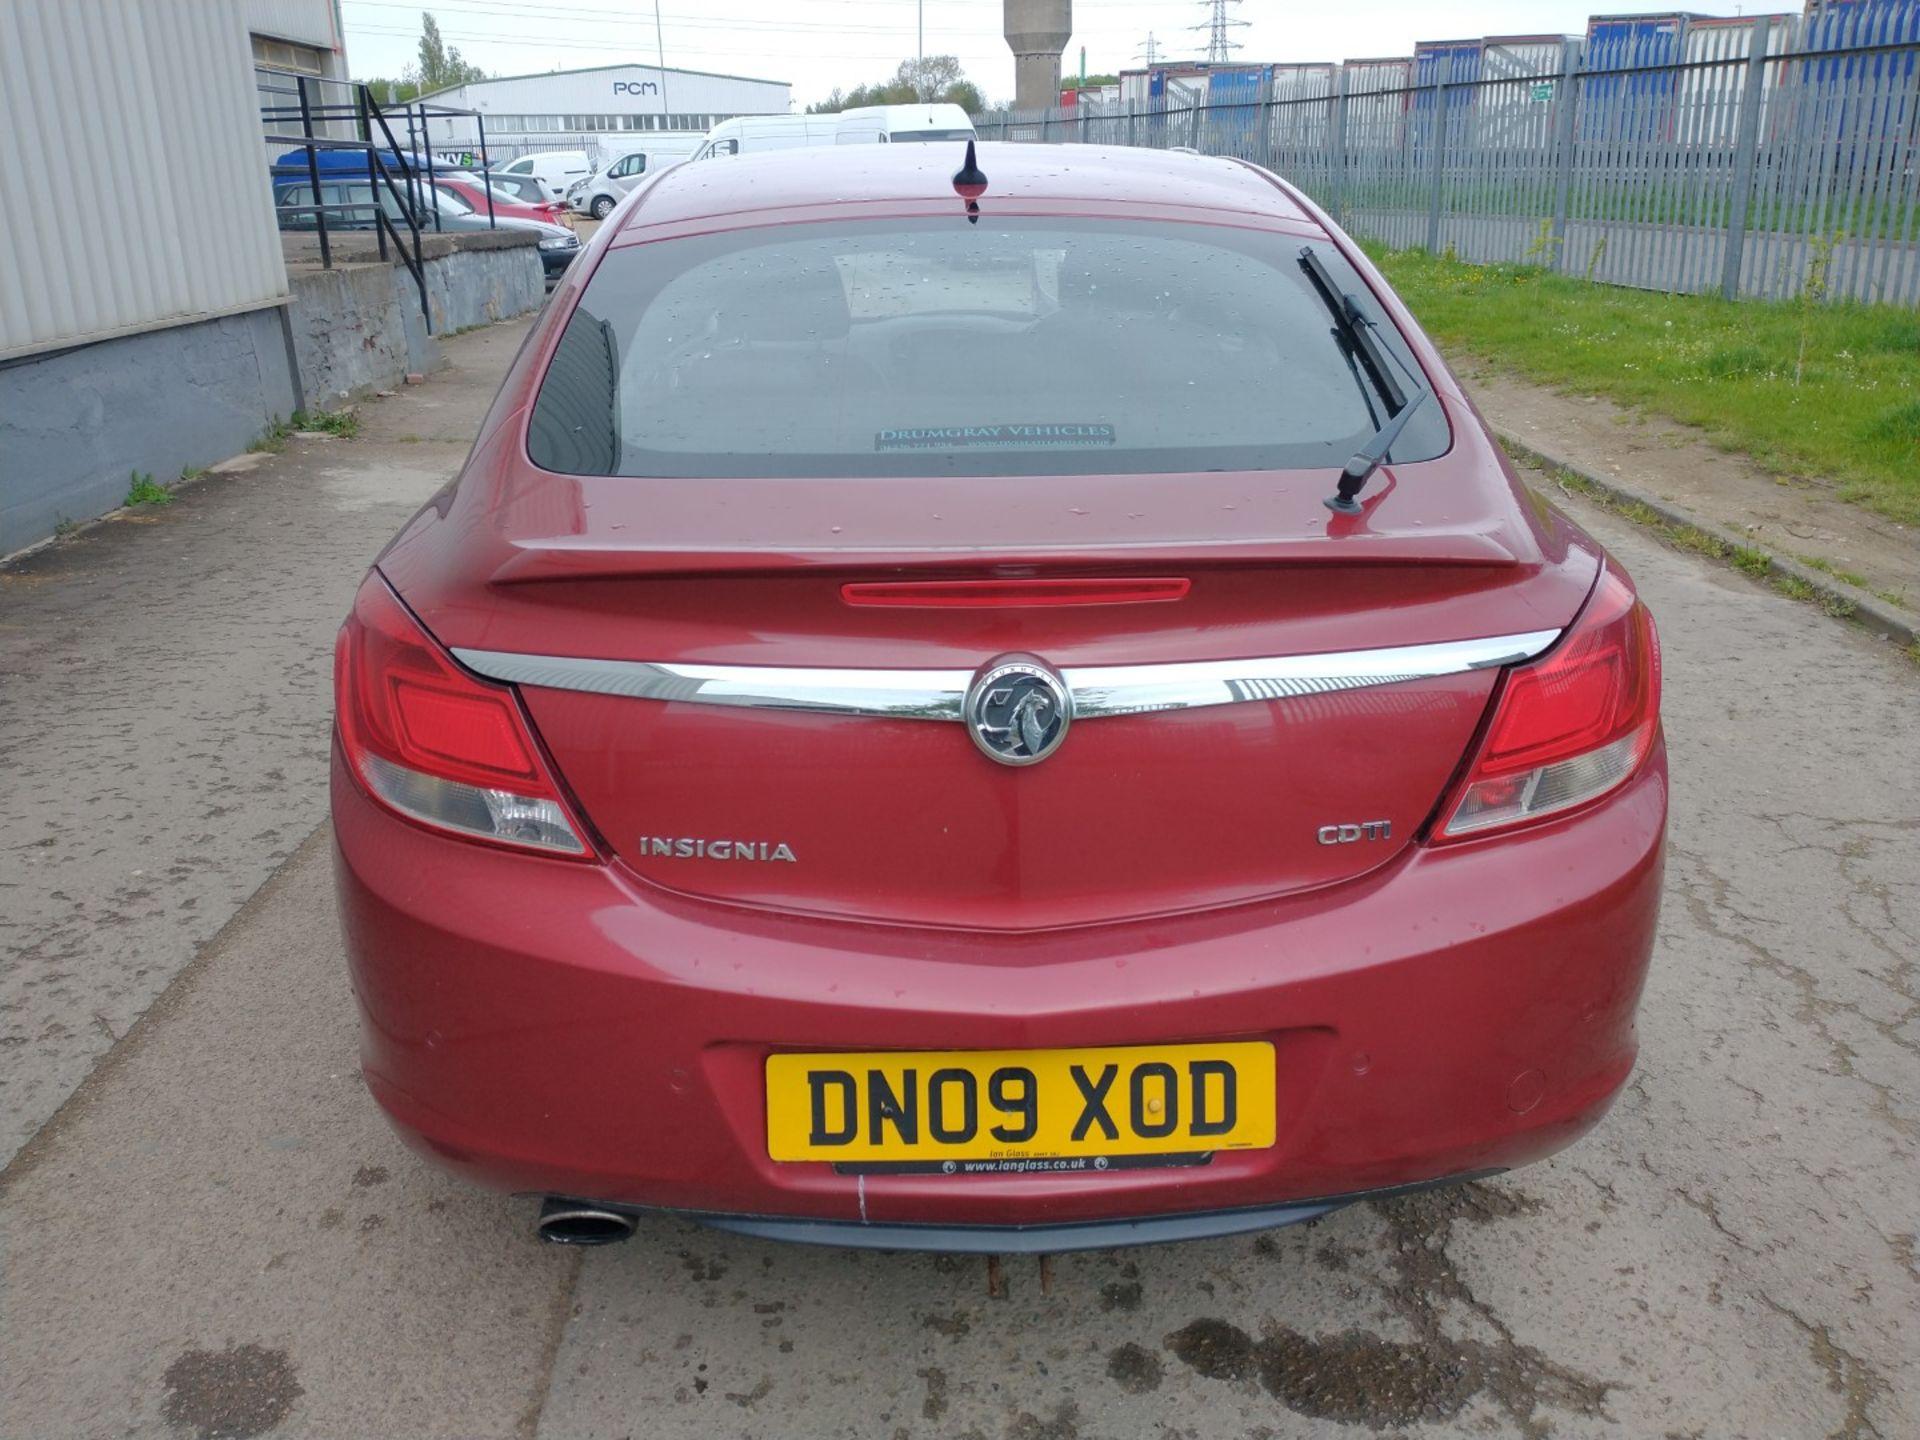 2009 Vauxhall Insignia Elite Nav CDTI 5dr 2.0 Diesel - CL505 - NO VAT ON THE HAMMER - Location: Corb - Image 6 of 22